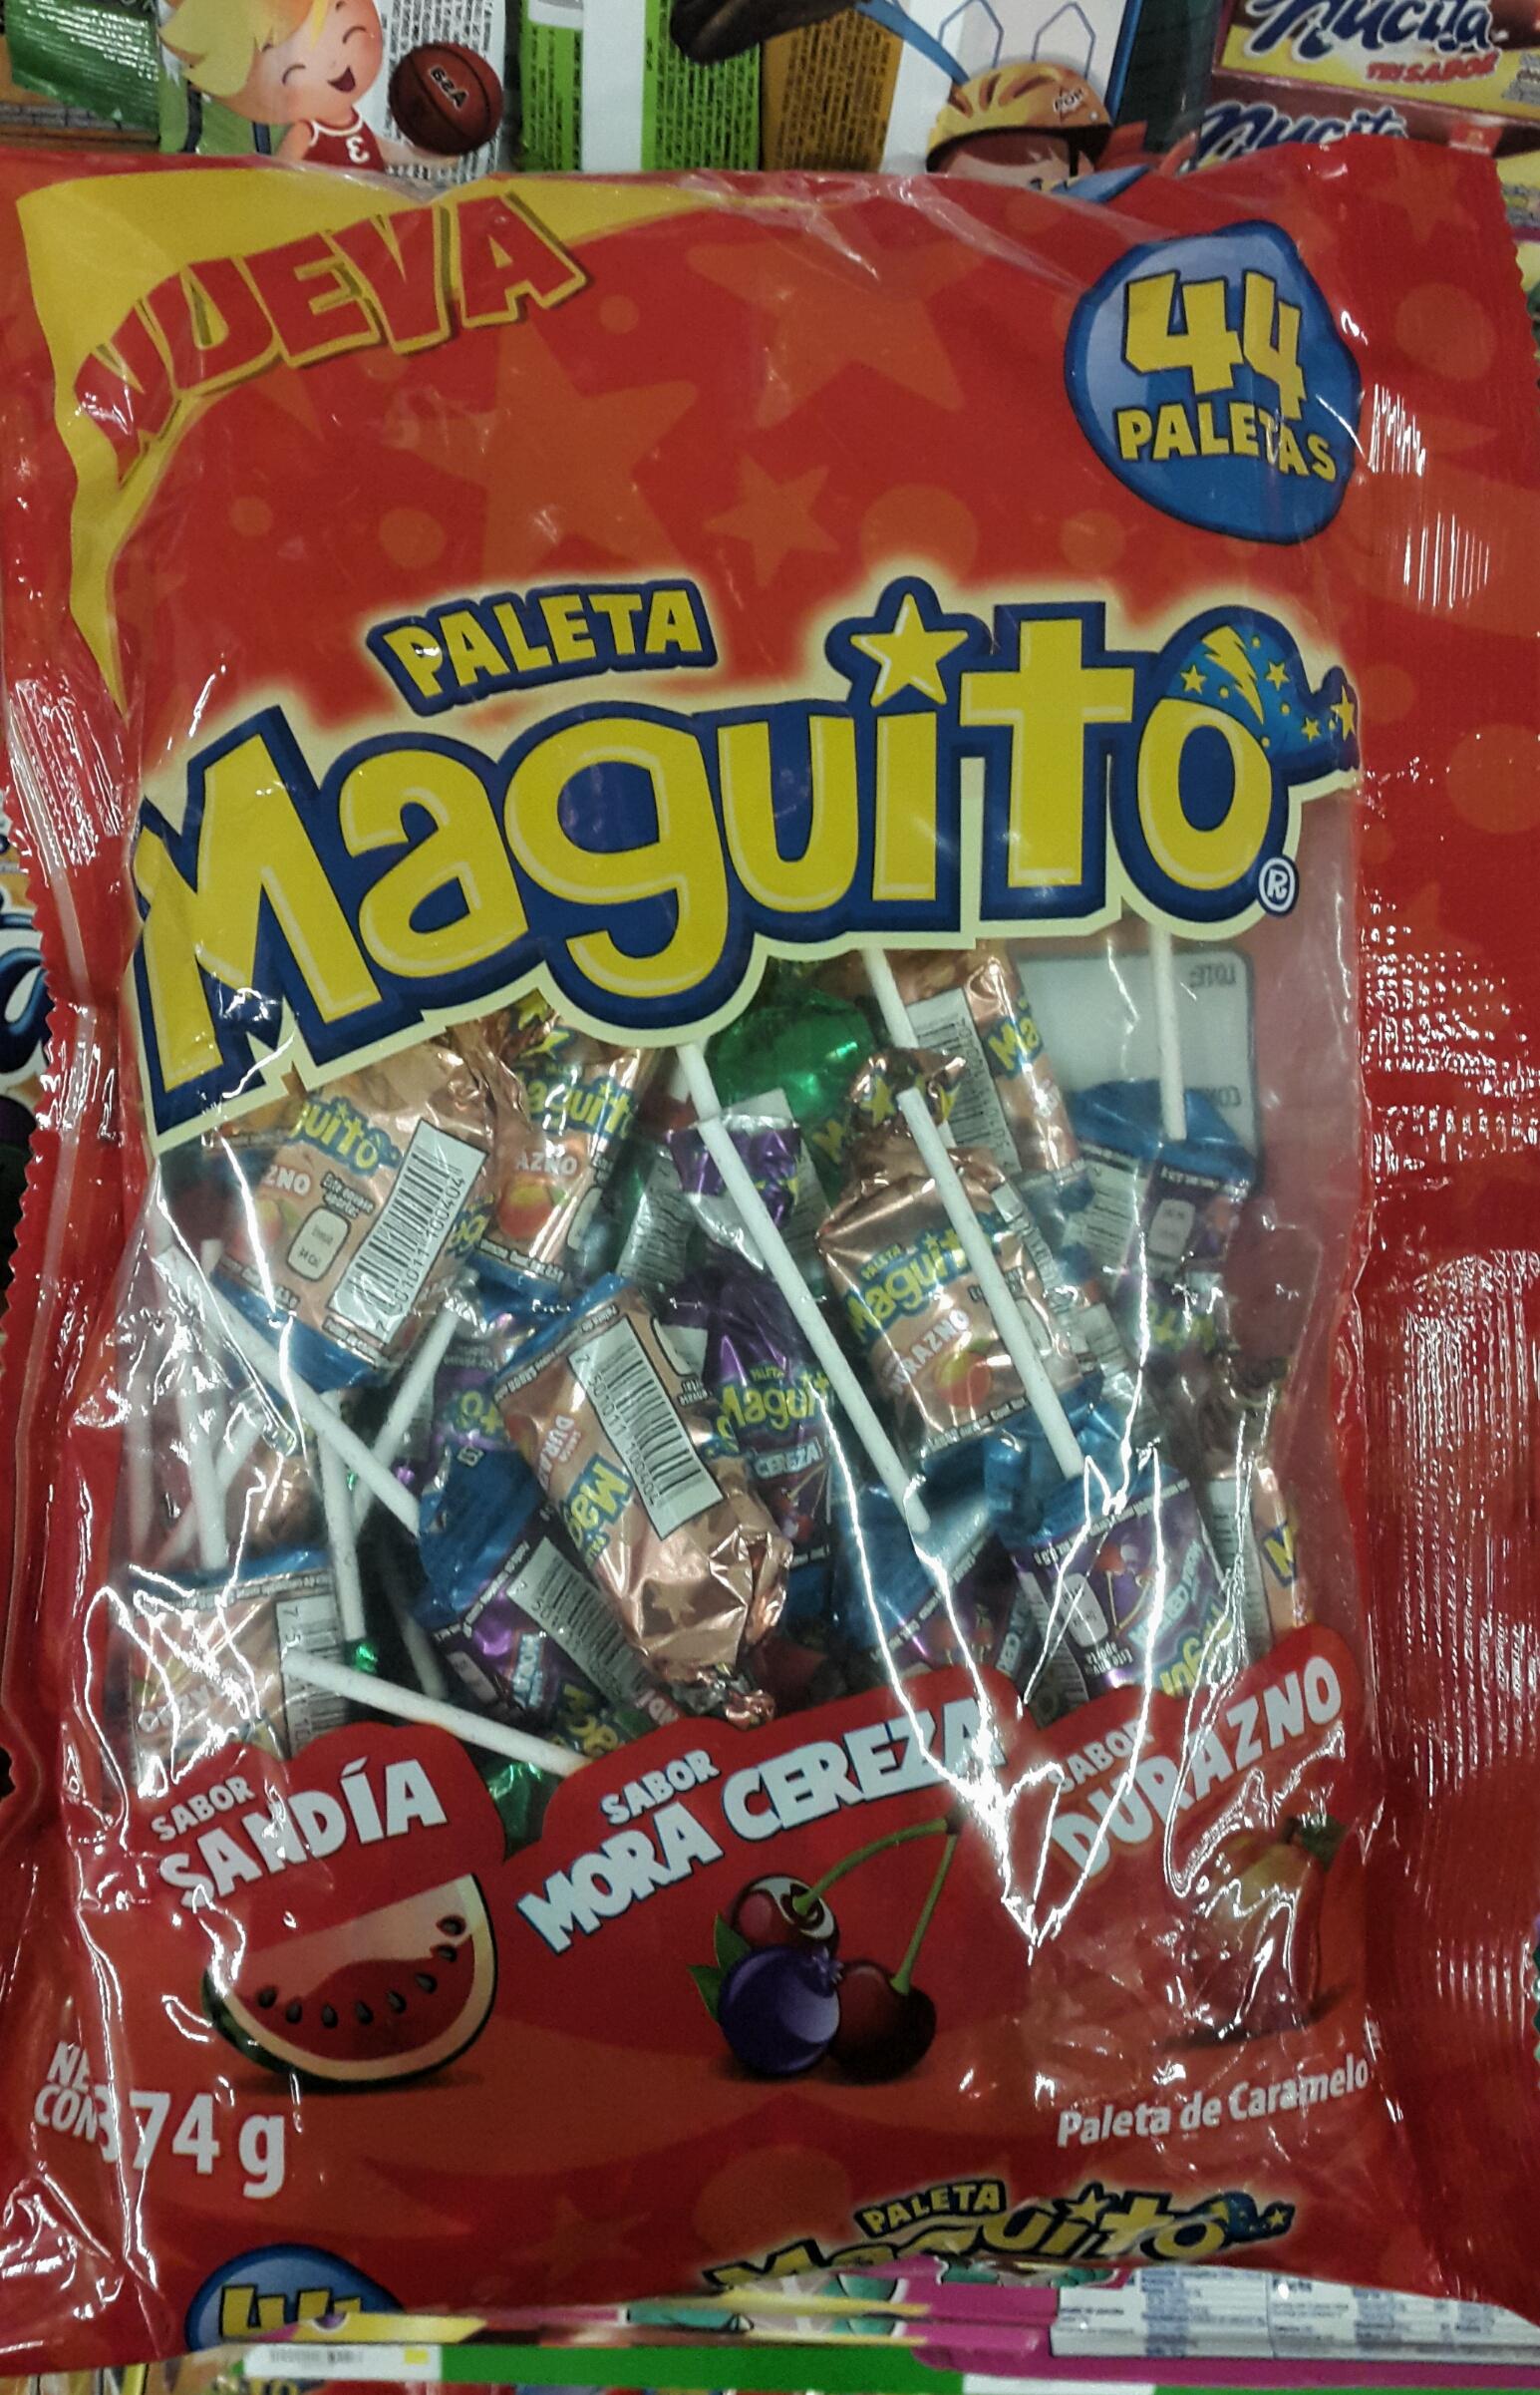 Bolsa de paletas manguito en Bodega Aurrerá Guayabal